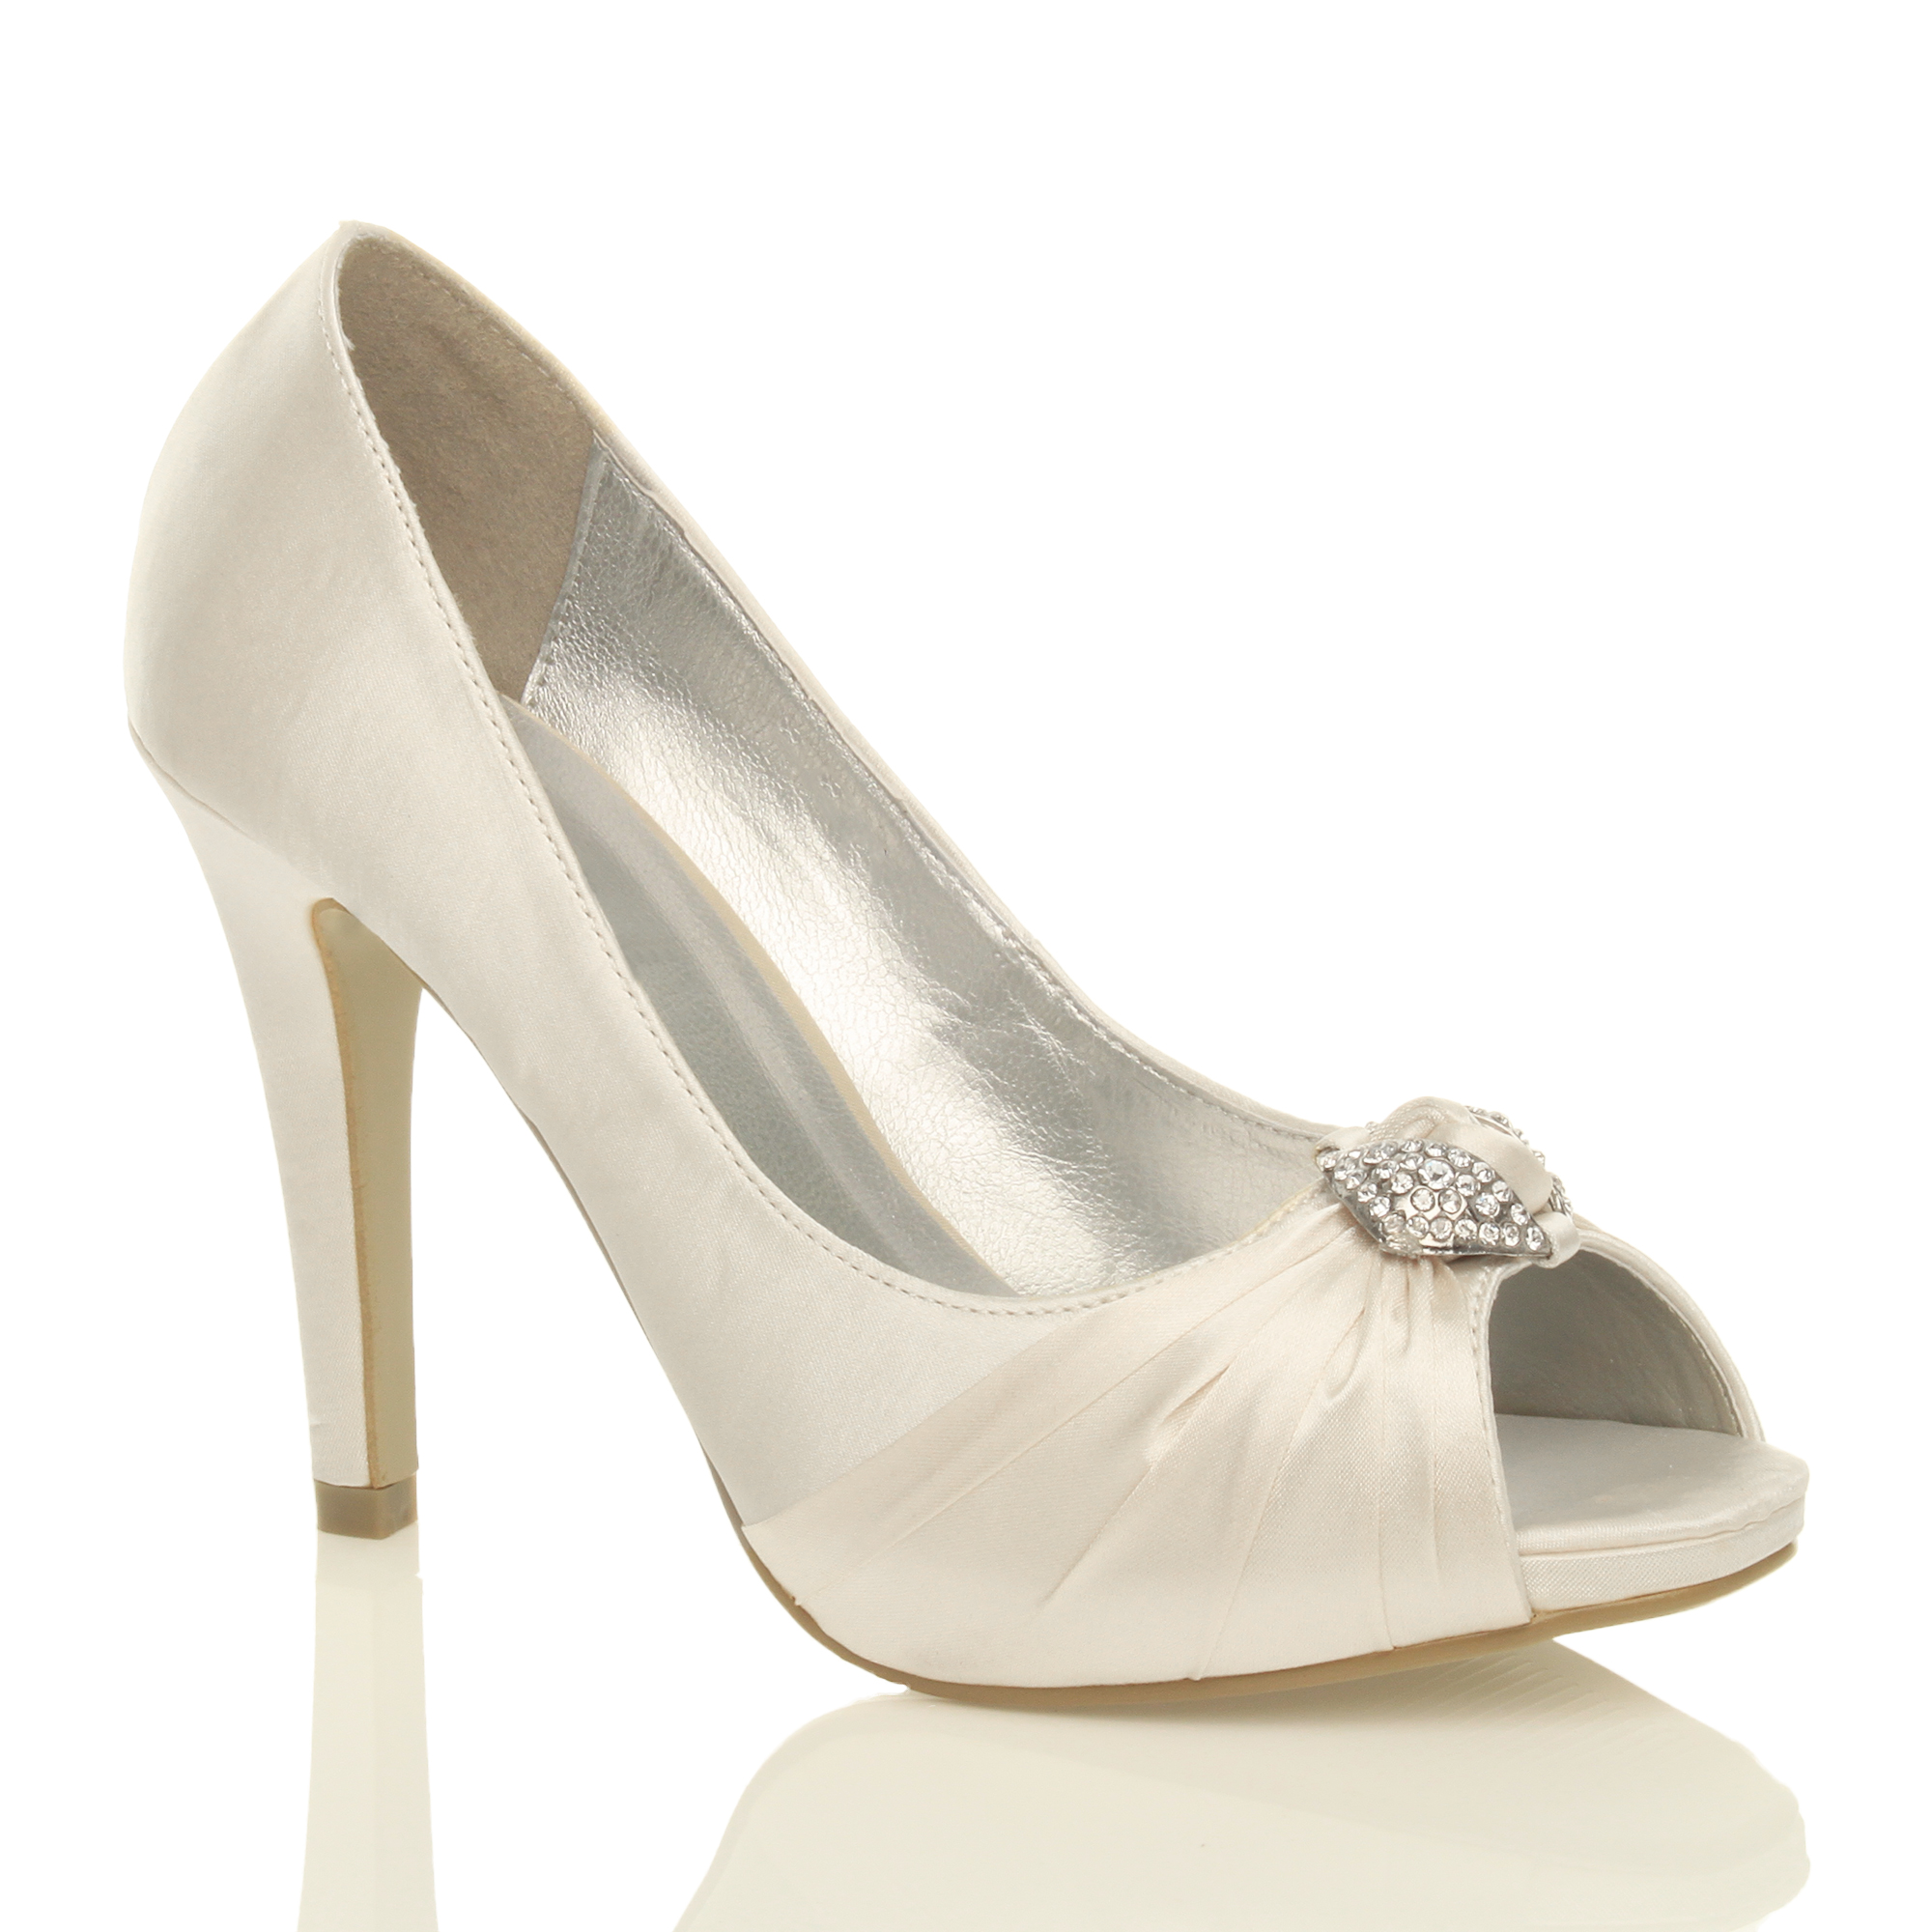 WOMENS LADIES HIGH HEEL PROM BRIDAL WEDDING PEEP TOE COURT SHOES SANDALS SIZE